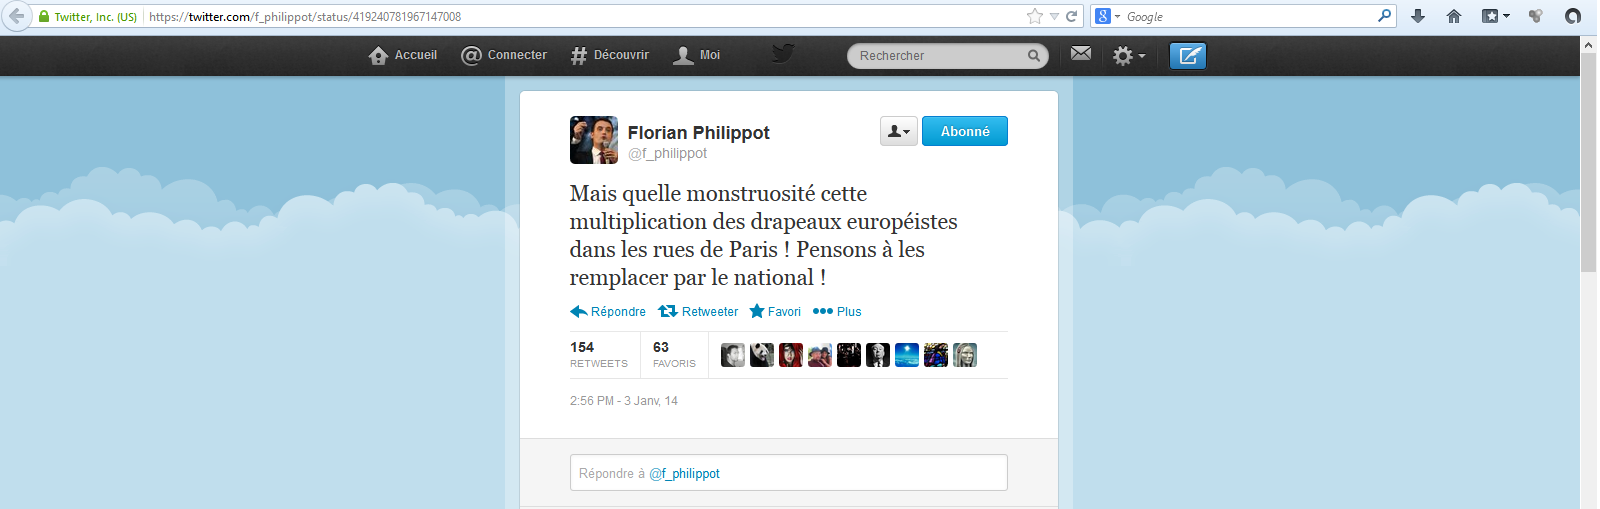 Florian-Philippot-04-01-14-Drapeaux-europeens